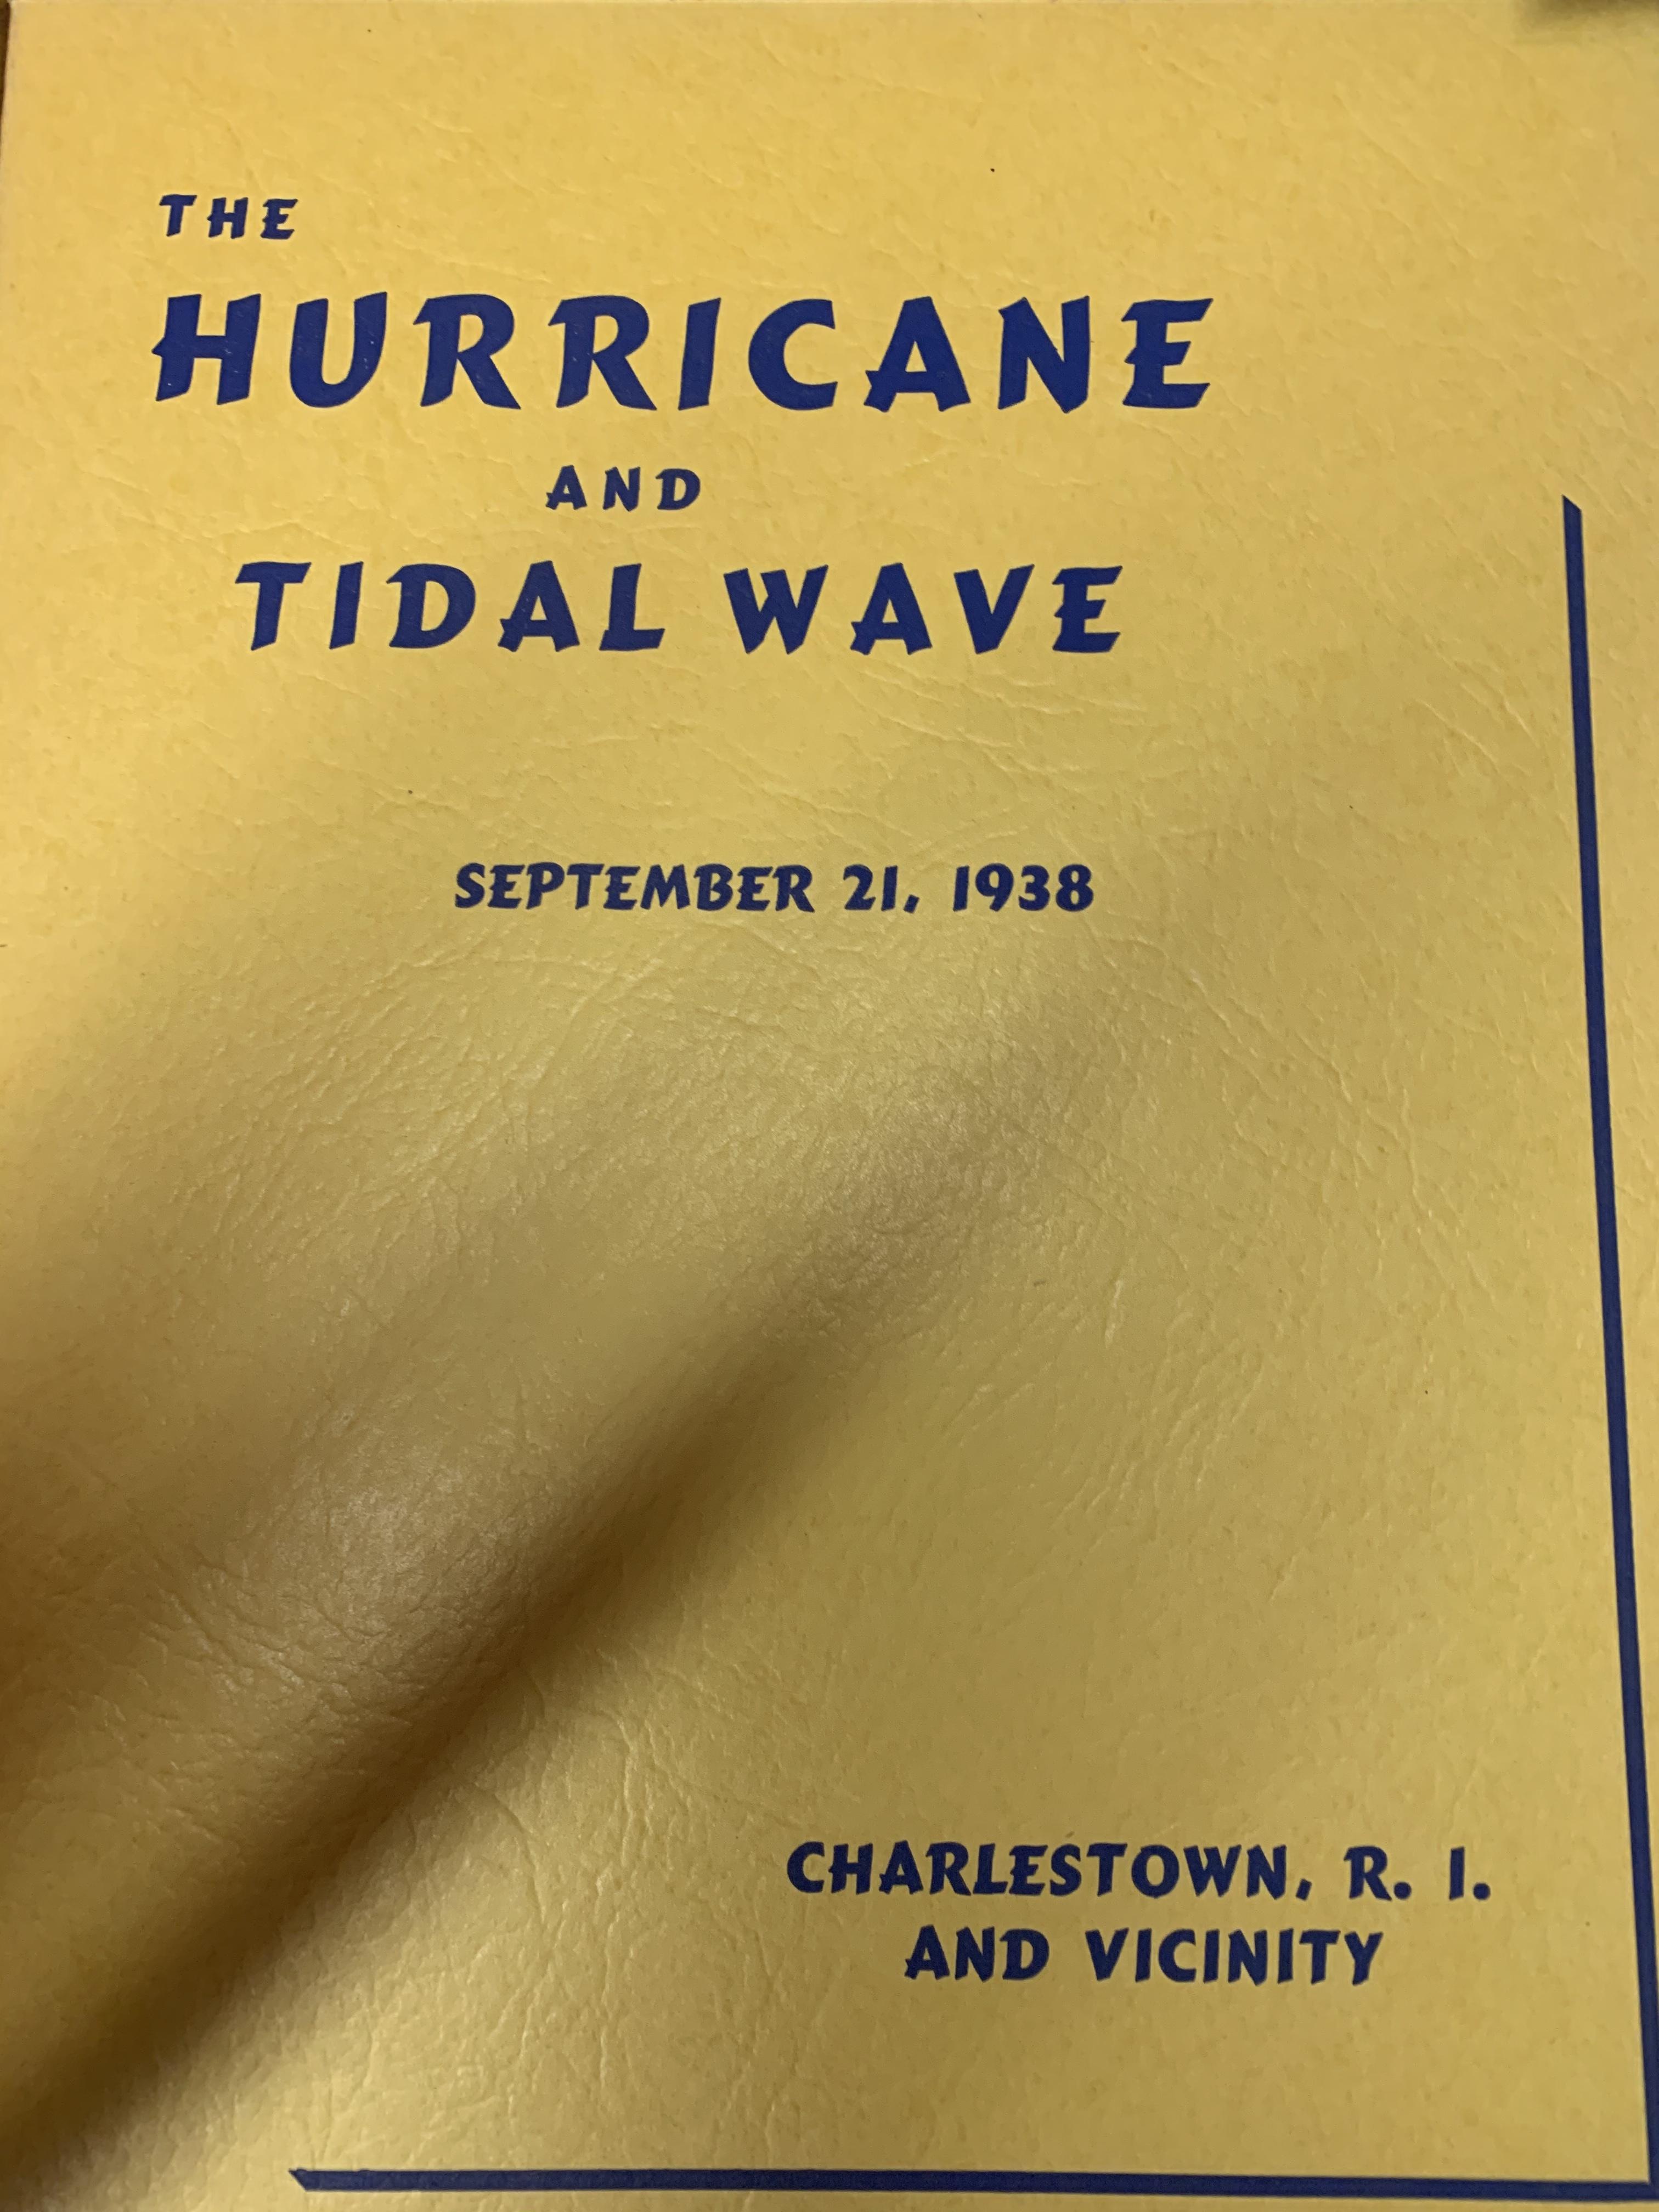 Original 1936 Edition